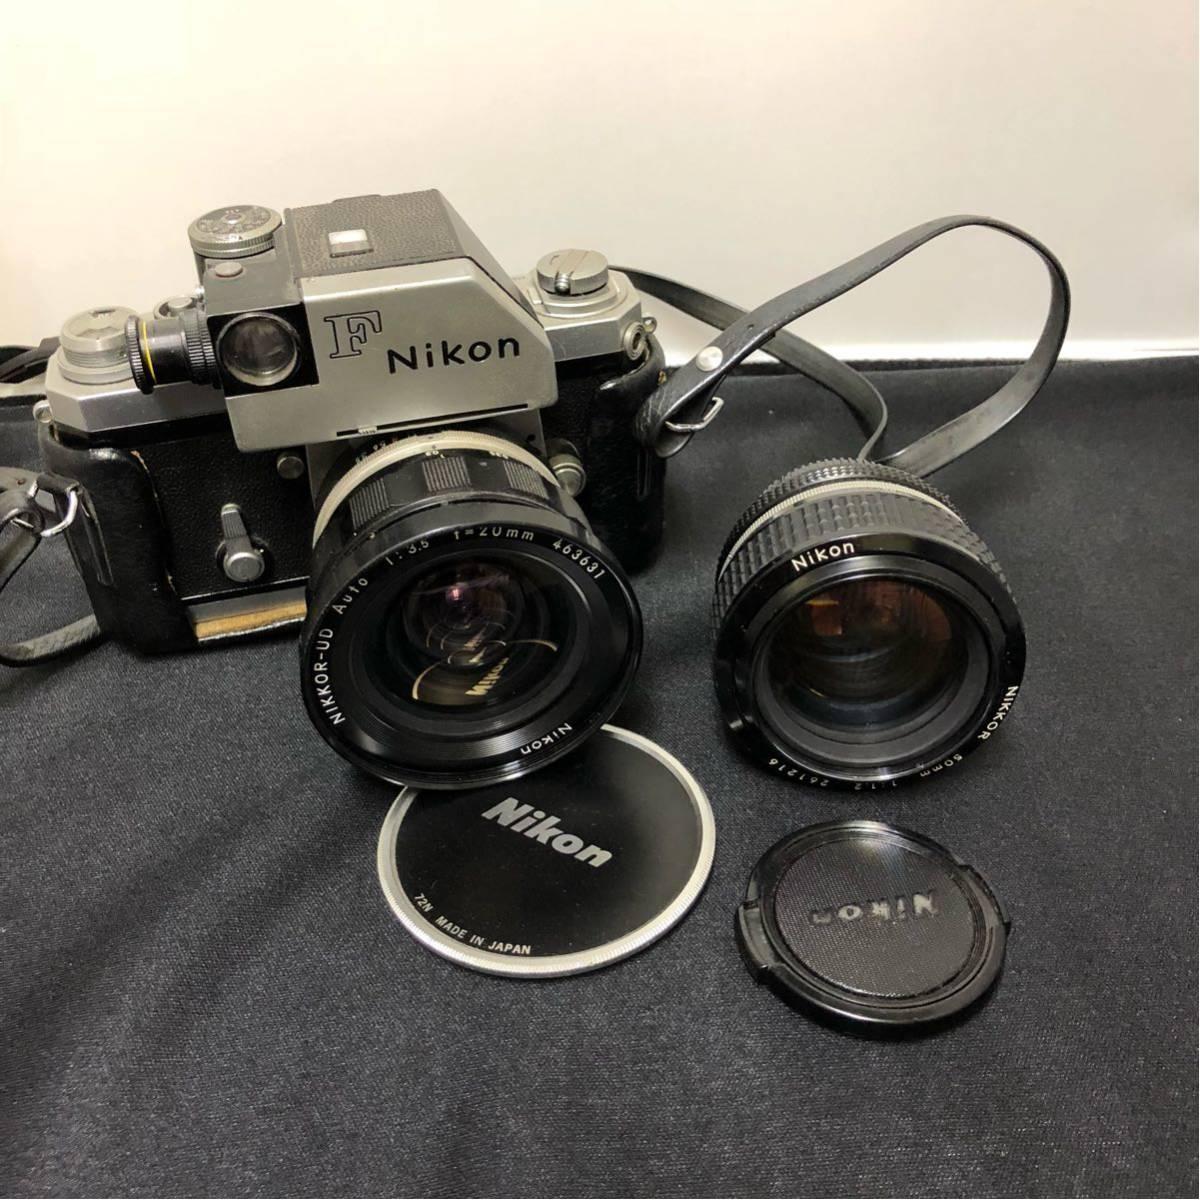 ♯ NIKON ニコン 一眼レフ カメラ F nikkor-ud 1:3.5 20mm nikkor 50mm 1:1.2 レンズ2本セット